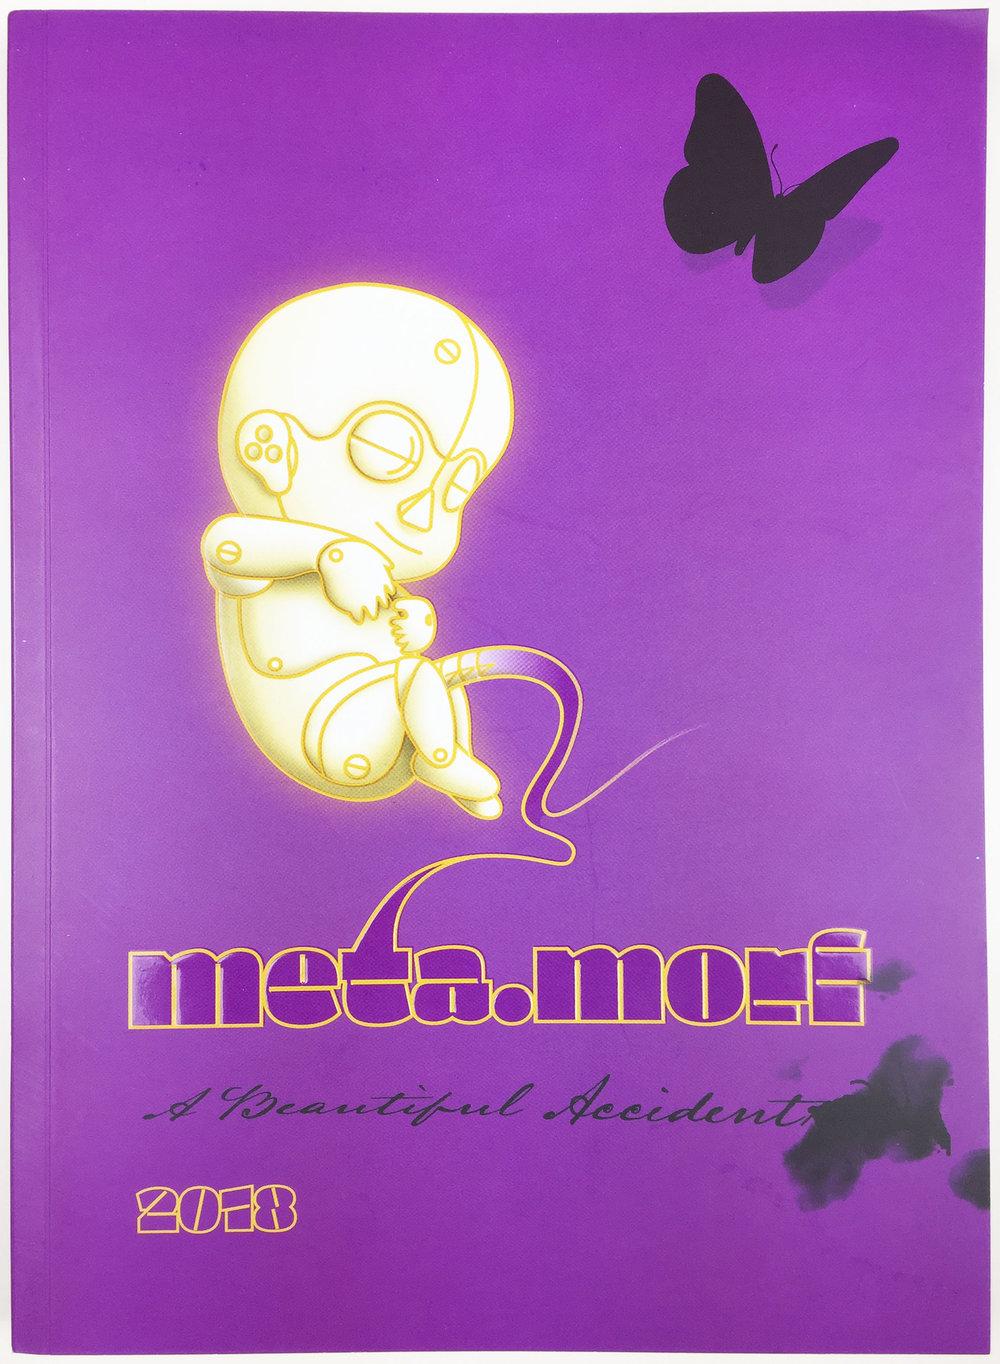 Meta.Morf : A Beautiful Accident  Espen Gangvik, Zane Cerpina (eds.). TEKS Publishing, 2018. SBN: 978-82-998211-7-9